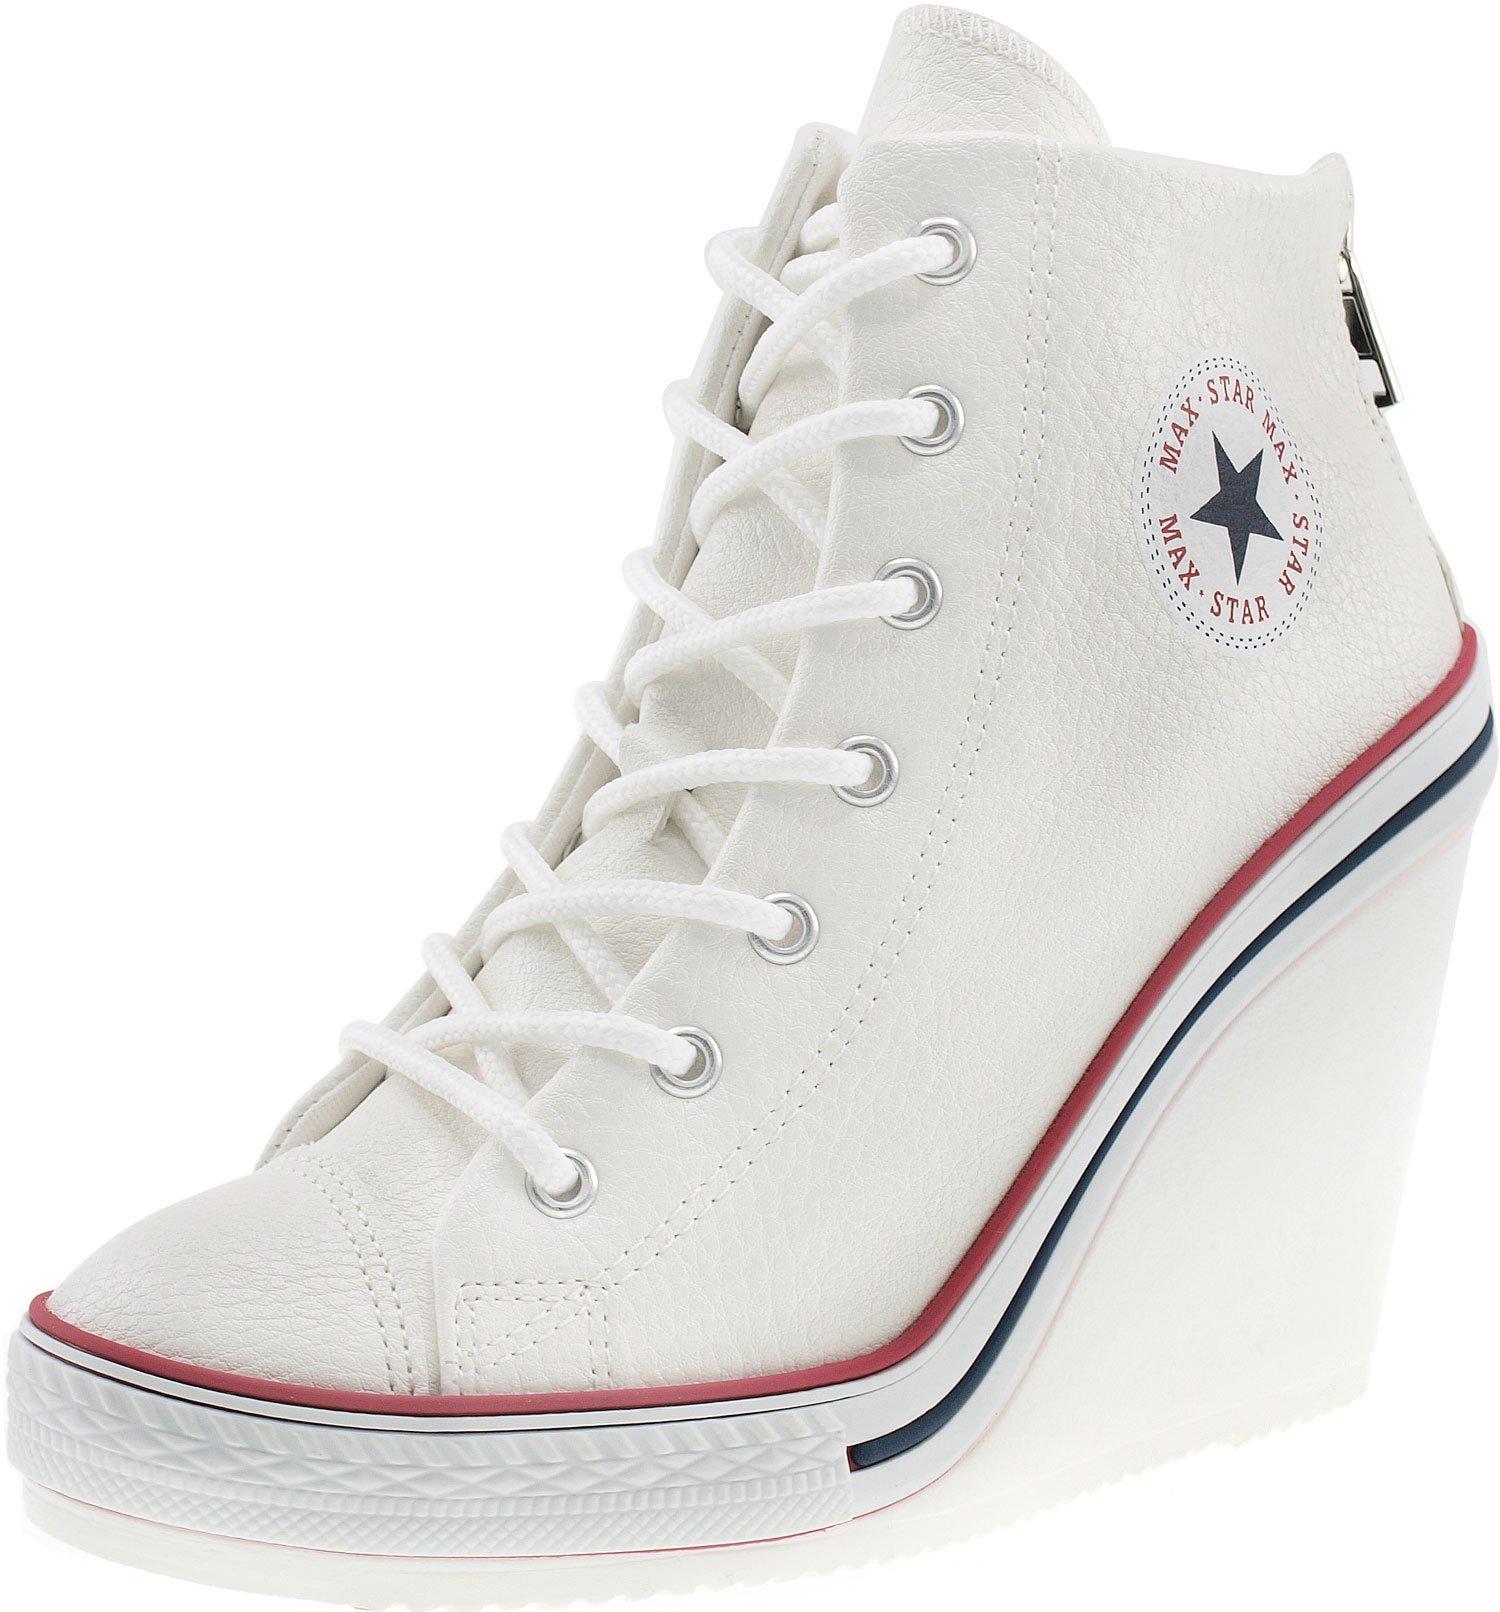 Maxstar Women's 777 Back Zipper PU High Wedge Heel Sneakers White 8 B(M) US